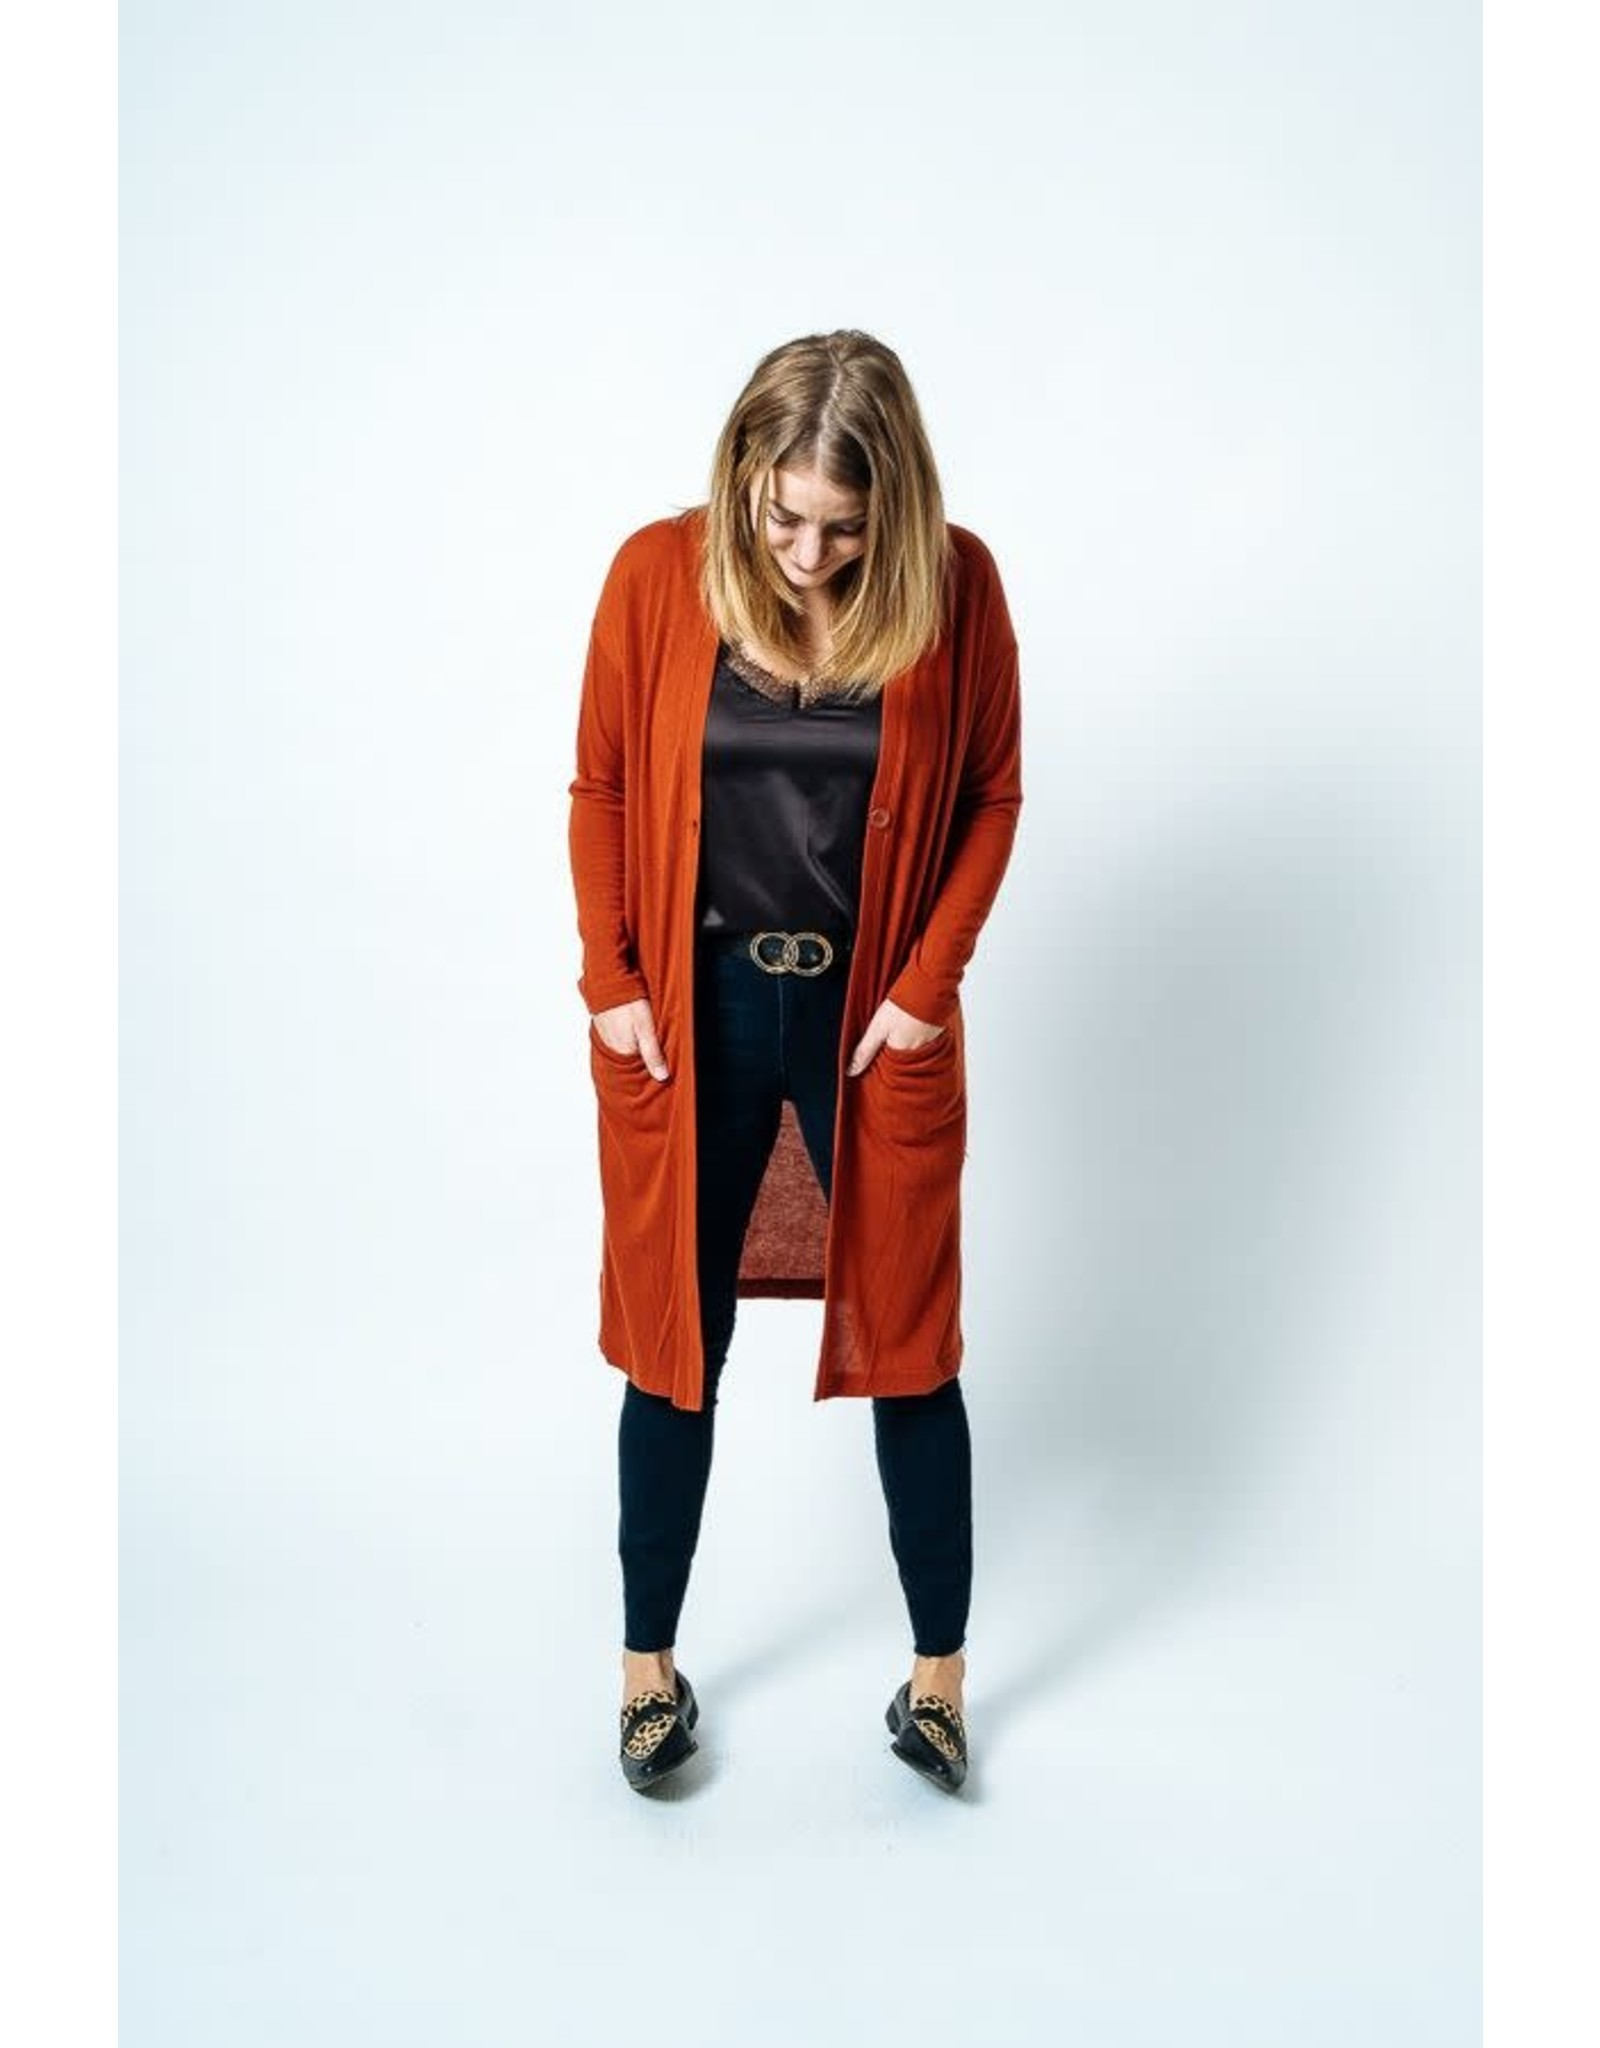 Papillon Papillon - Long cardigan with side slit (rust)